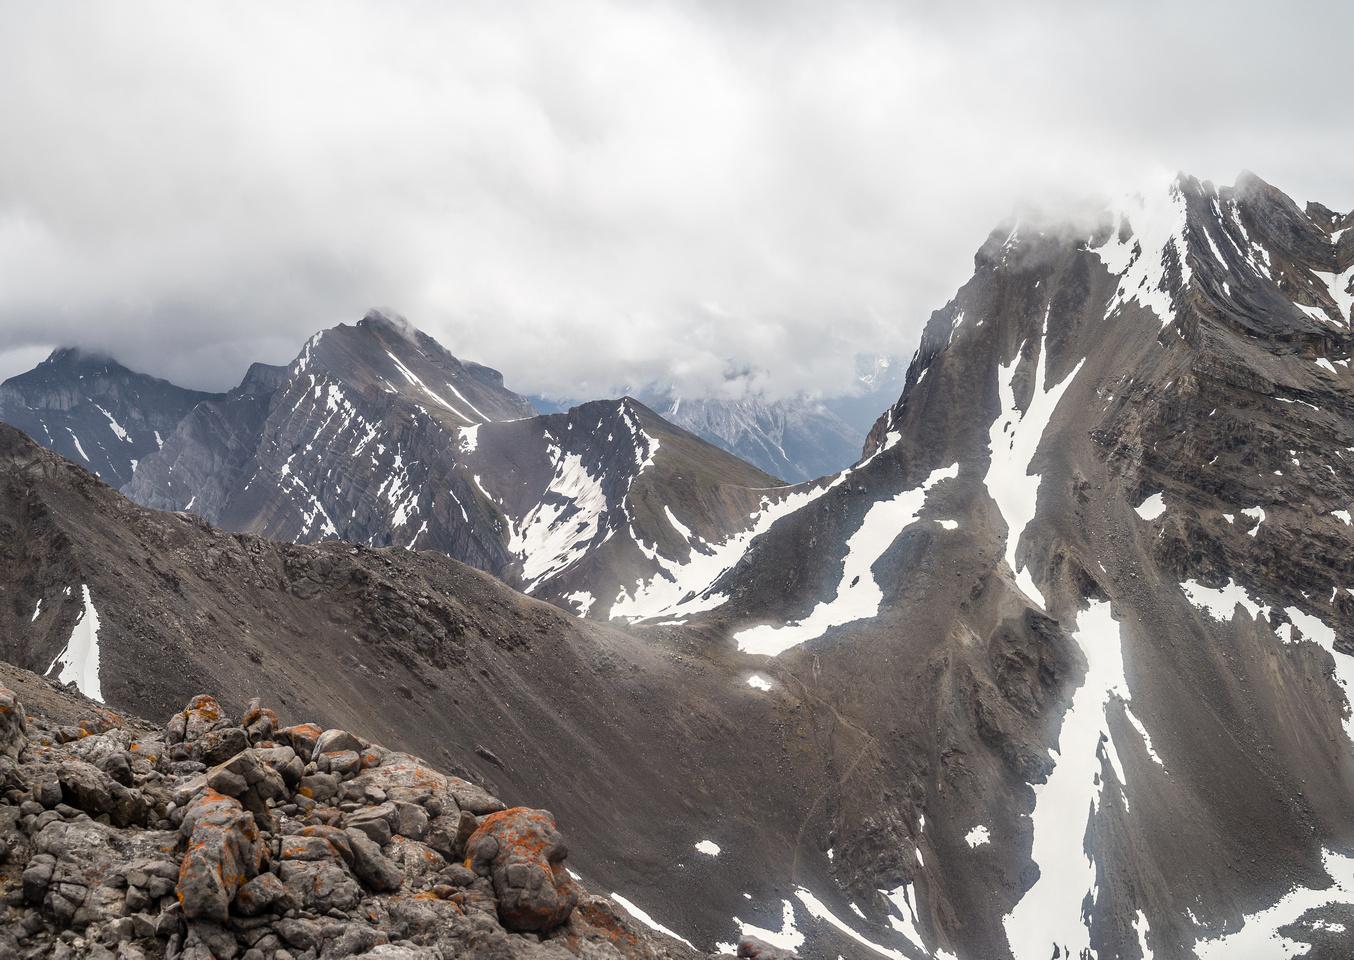 One more view towards Buller and Guinn's Passes past Lillian Peak towards Mount Kidd (L).